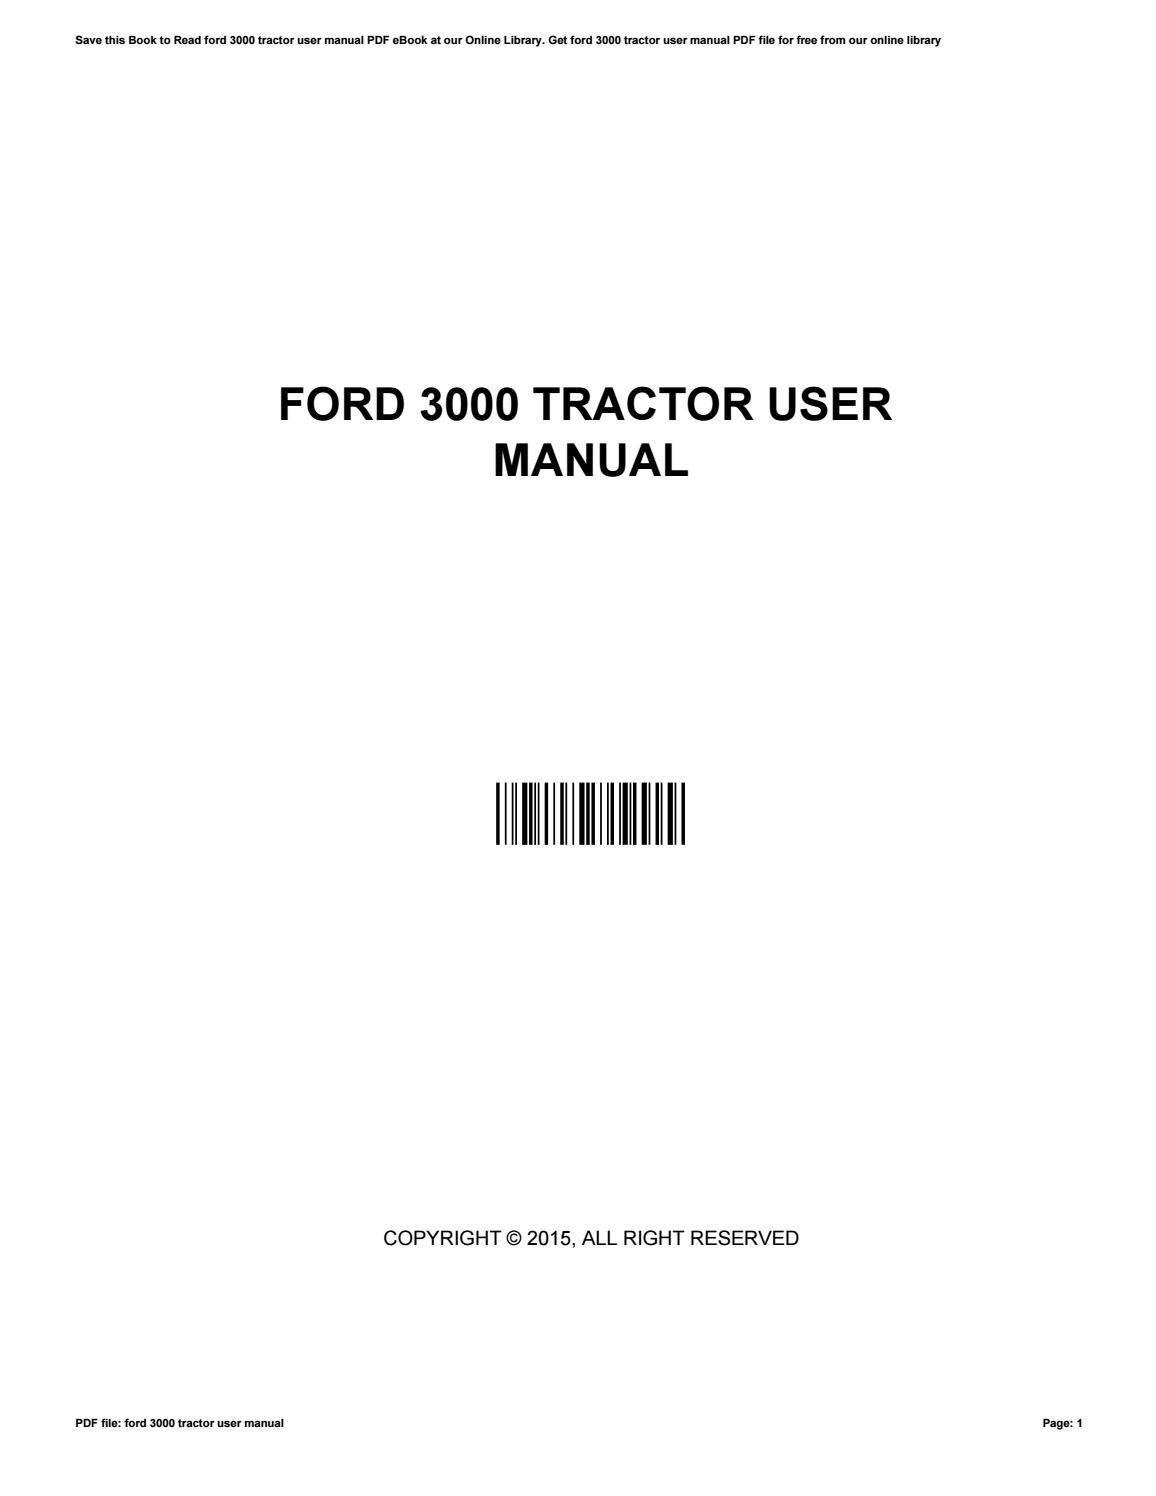 Ford tractor user manual claytoncruz issuu jpg 1156x1496 Ford 3000 tractor  manual